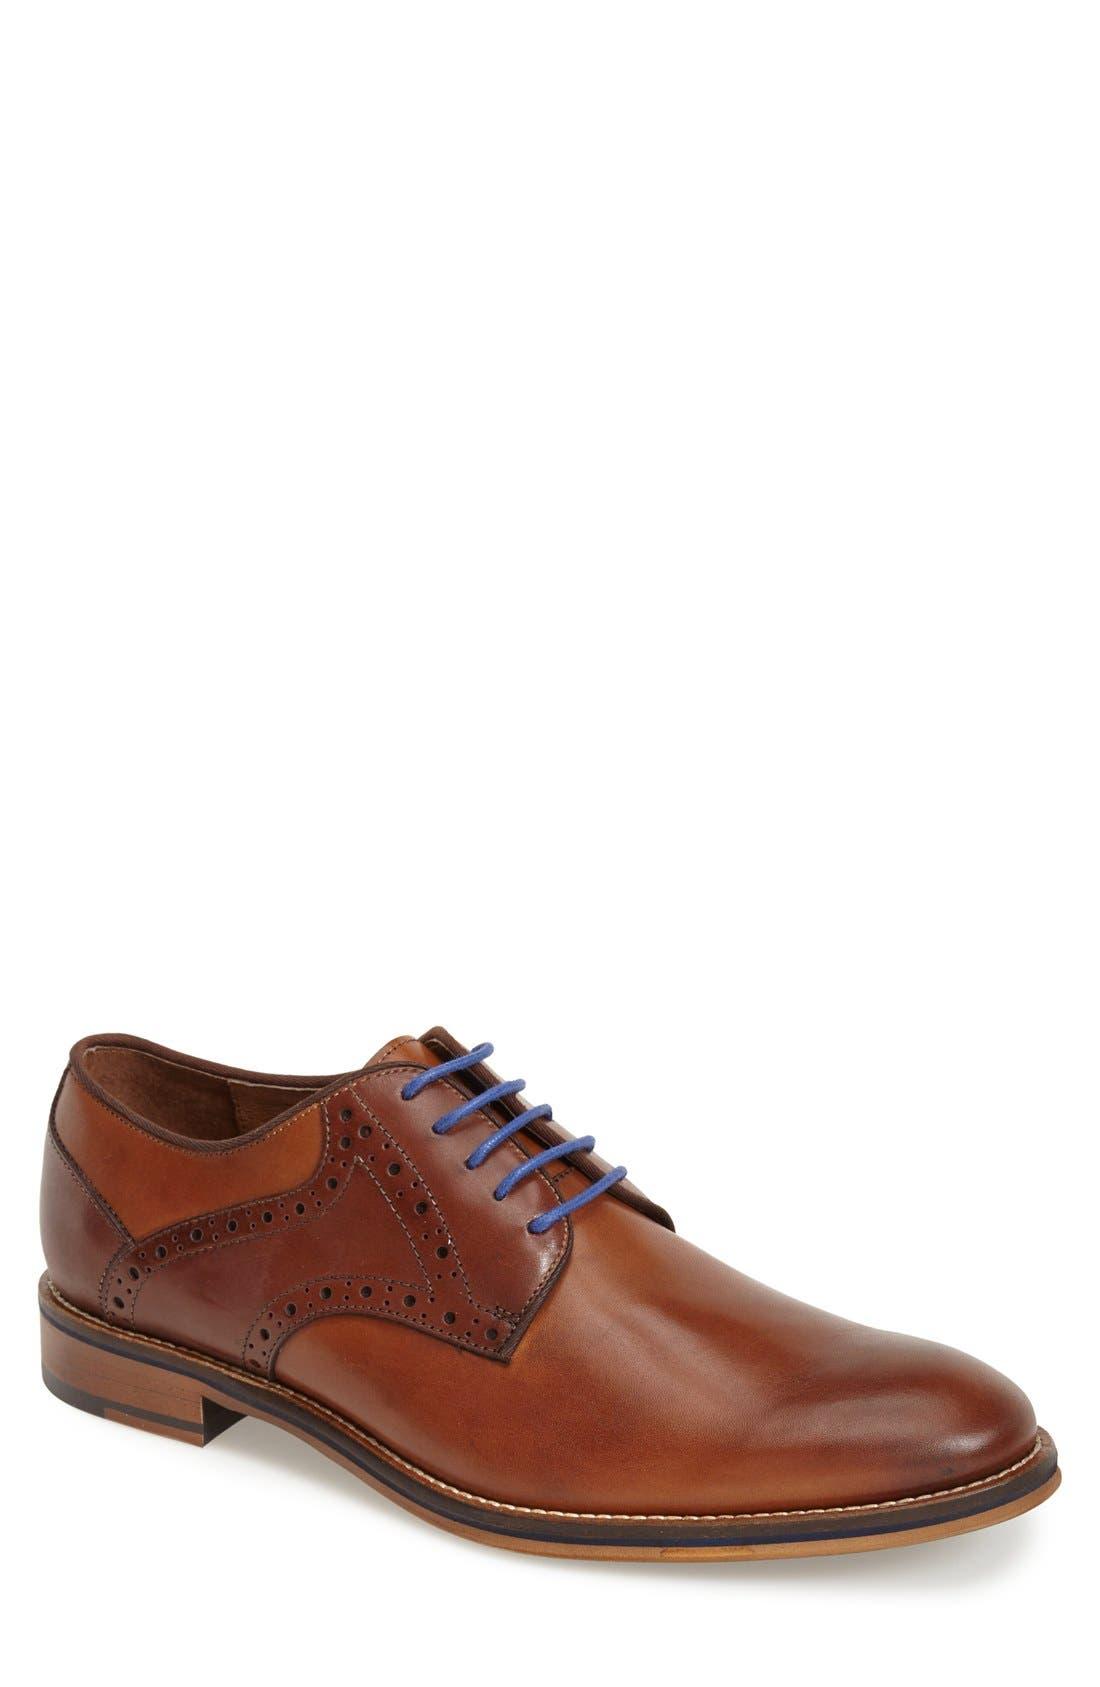 Conard Saddle Shoe,                         Main,                         color, TAN/ DARK BROWN